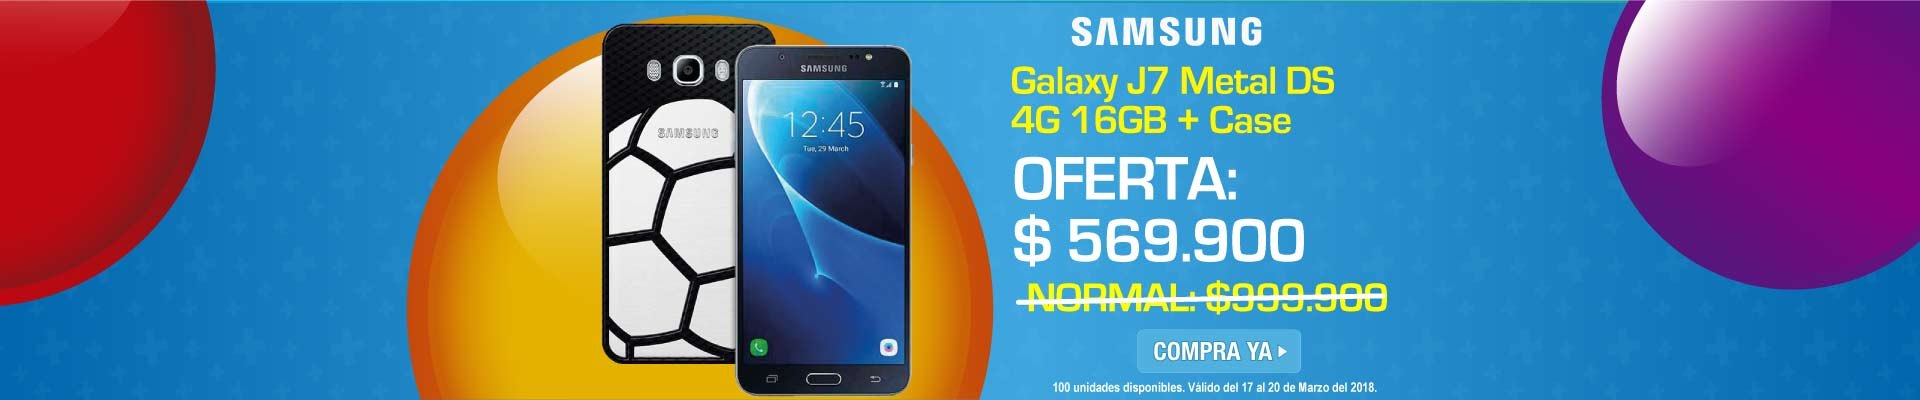 CAT ALKP-4-celulares-Celular Libre SAMSUNG Galaxy J7 Metal DS 4G -prod-Marzo17-20